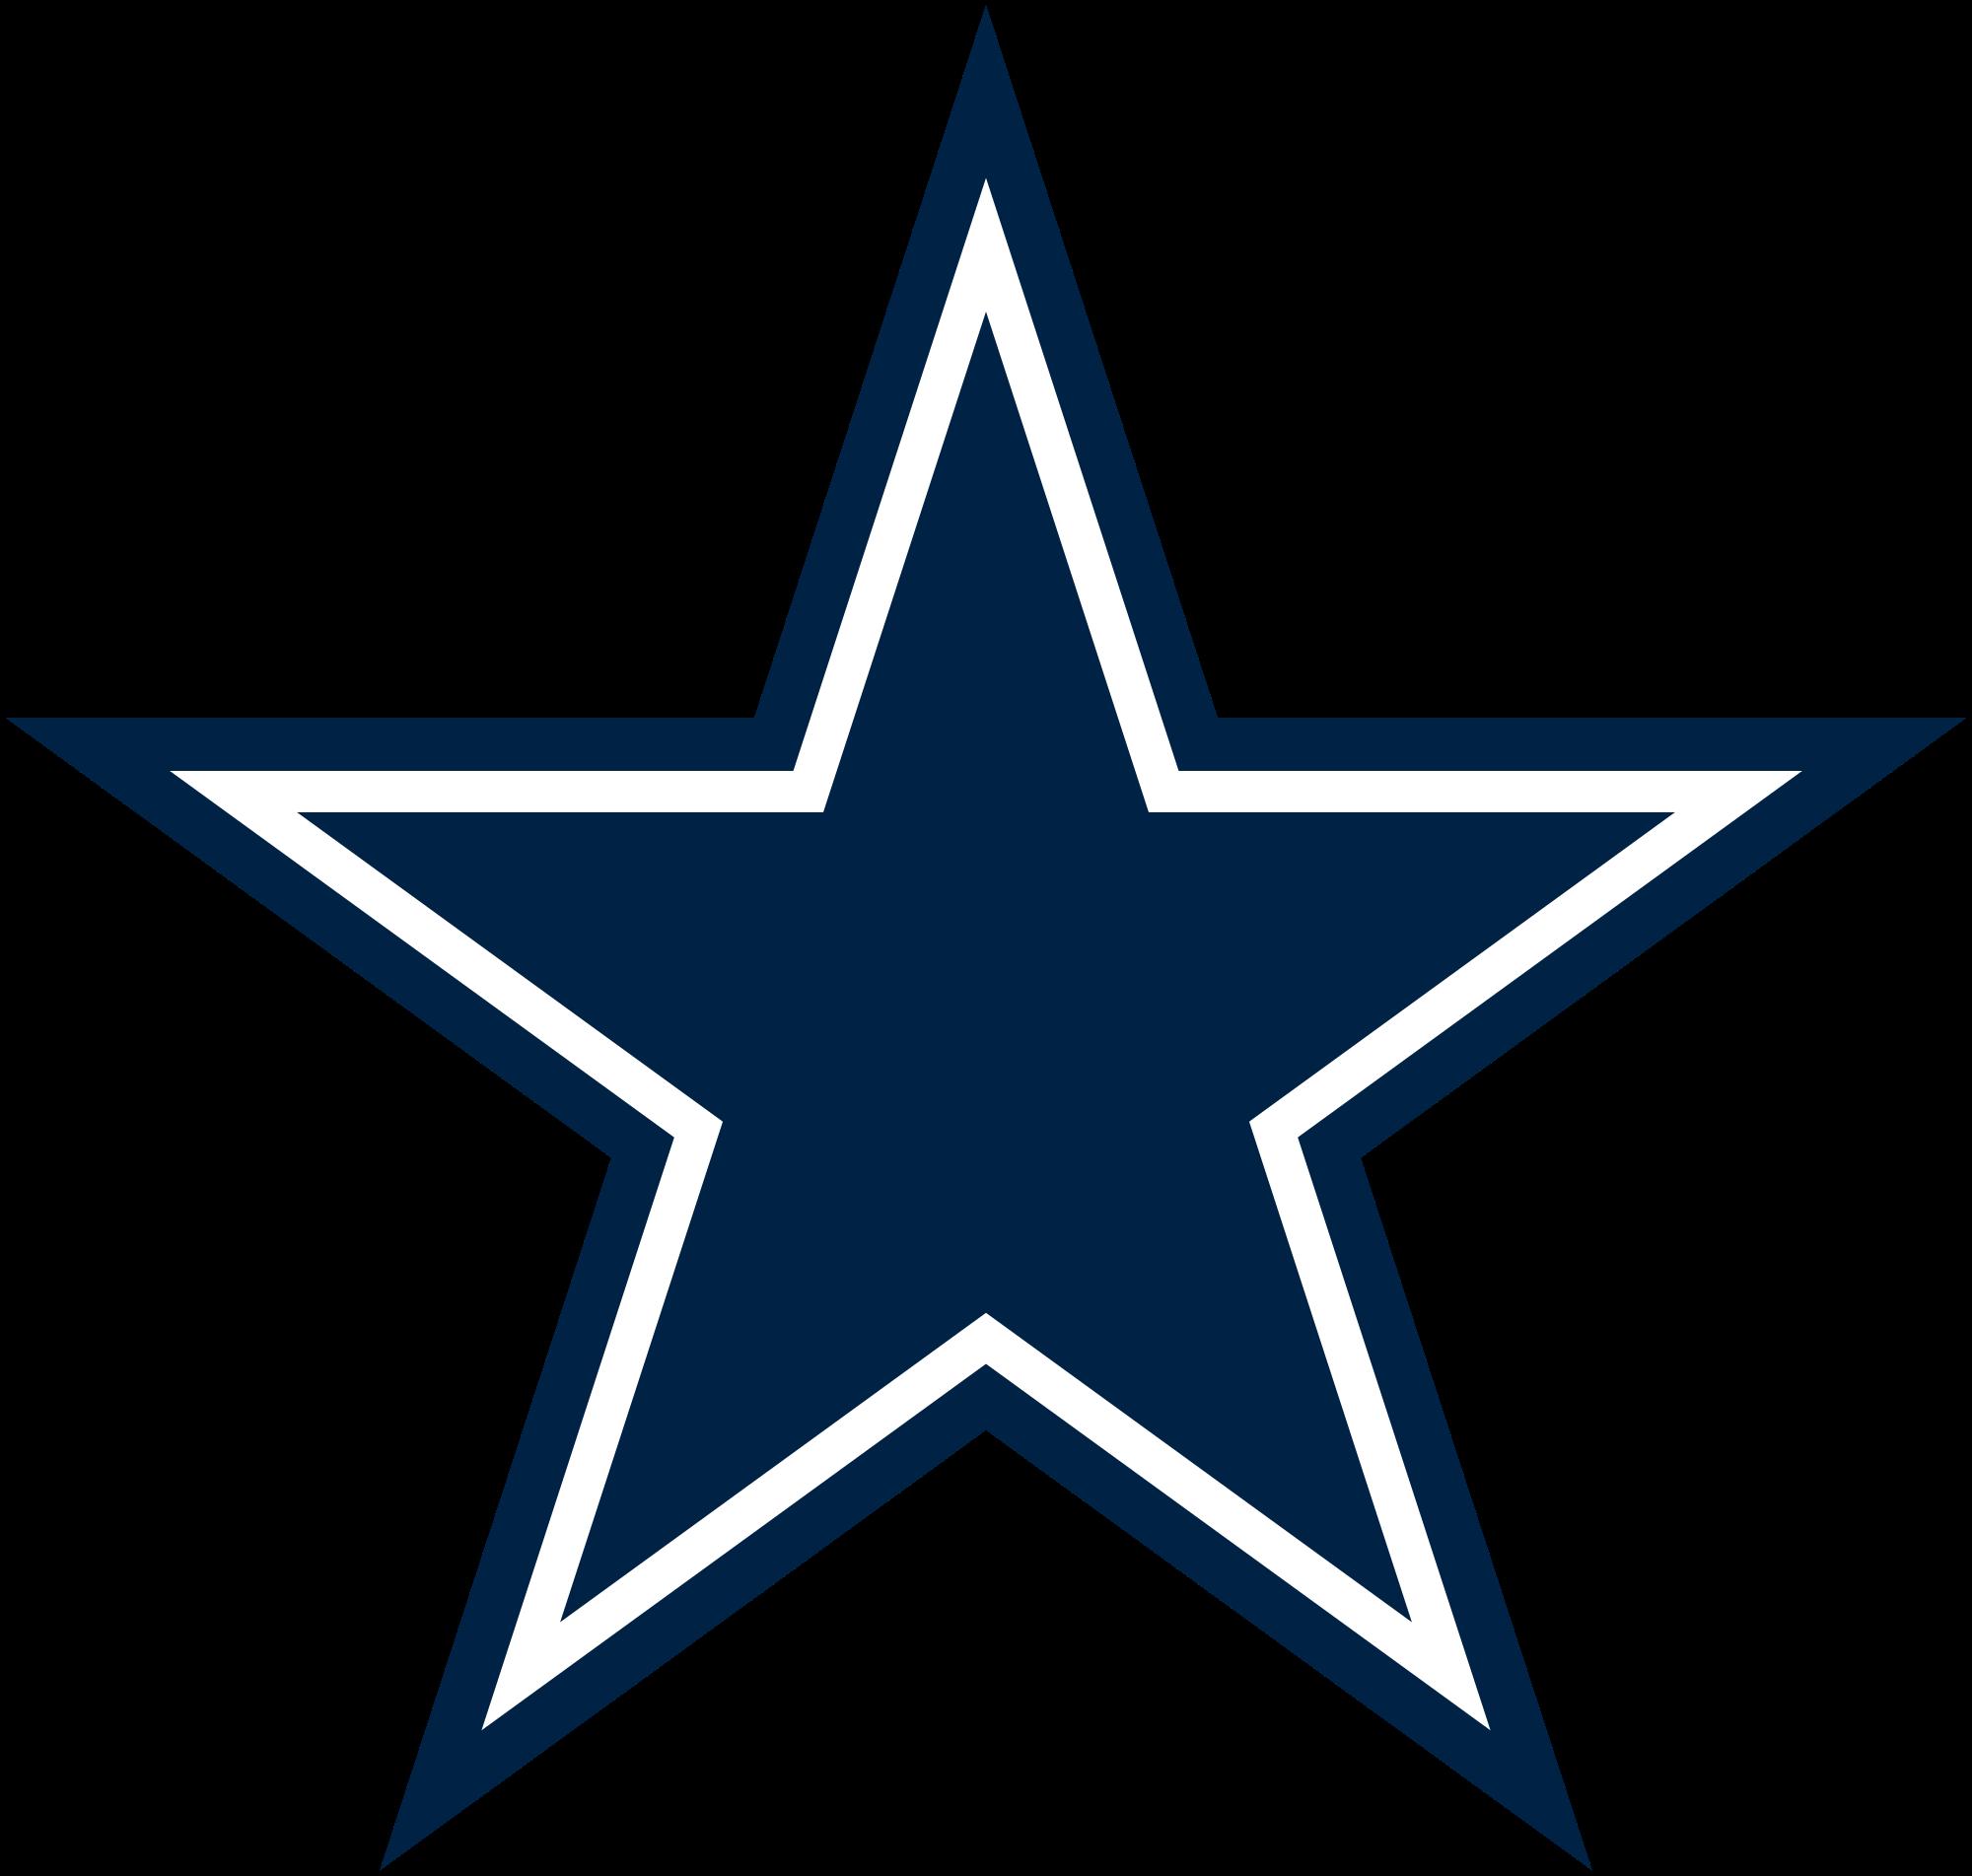 Dallas Cowboys Part Ways with Wide Receiver Dez Bryant